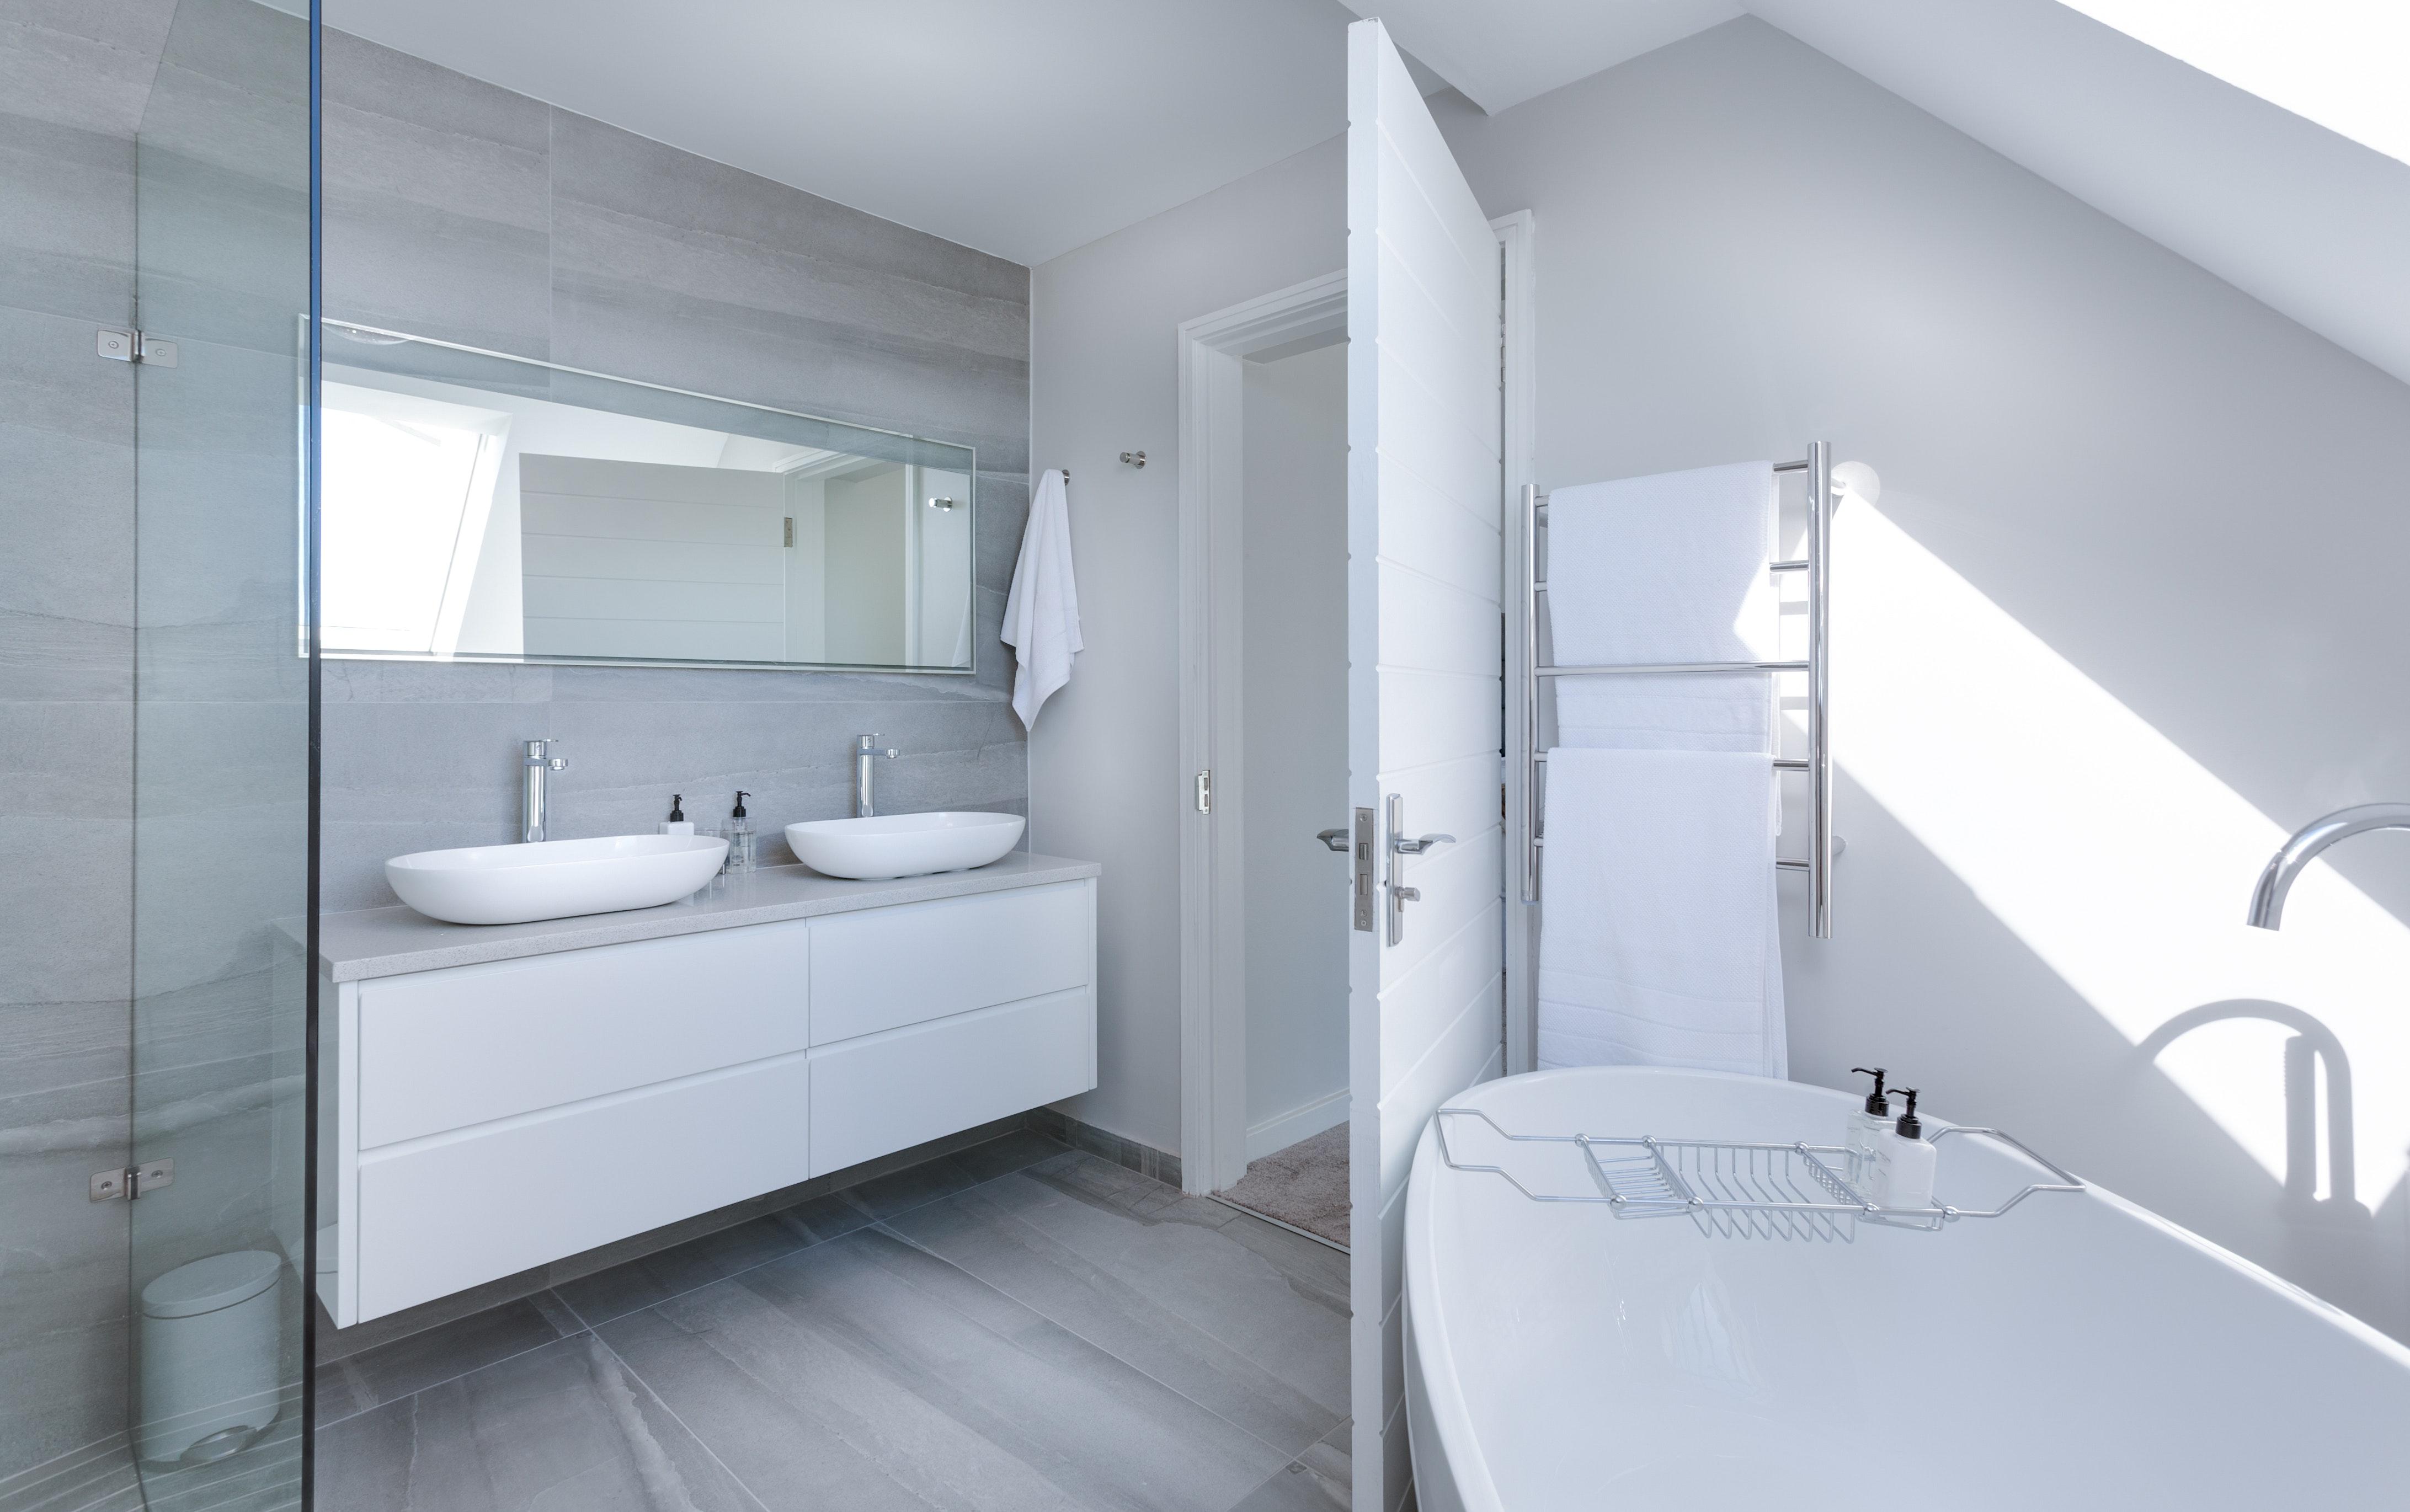 architecture-bathroom-bathtub-1454804